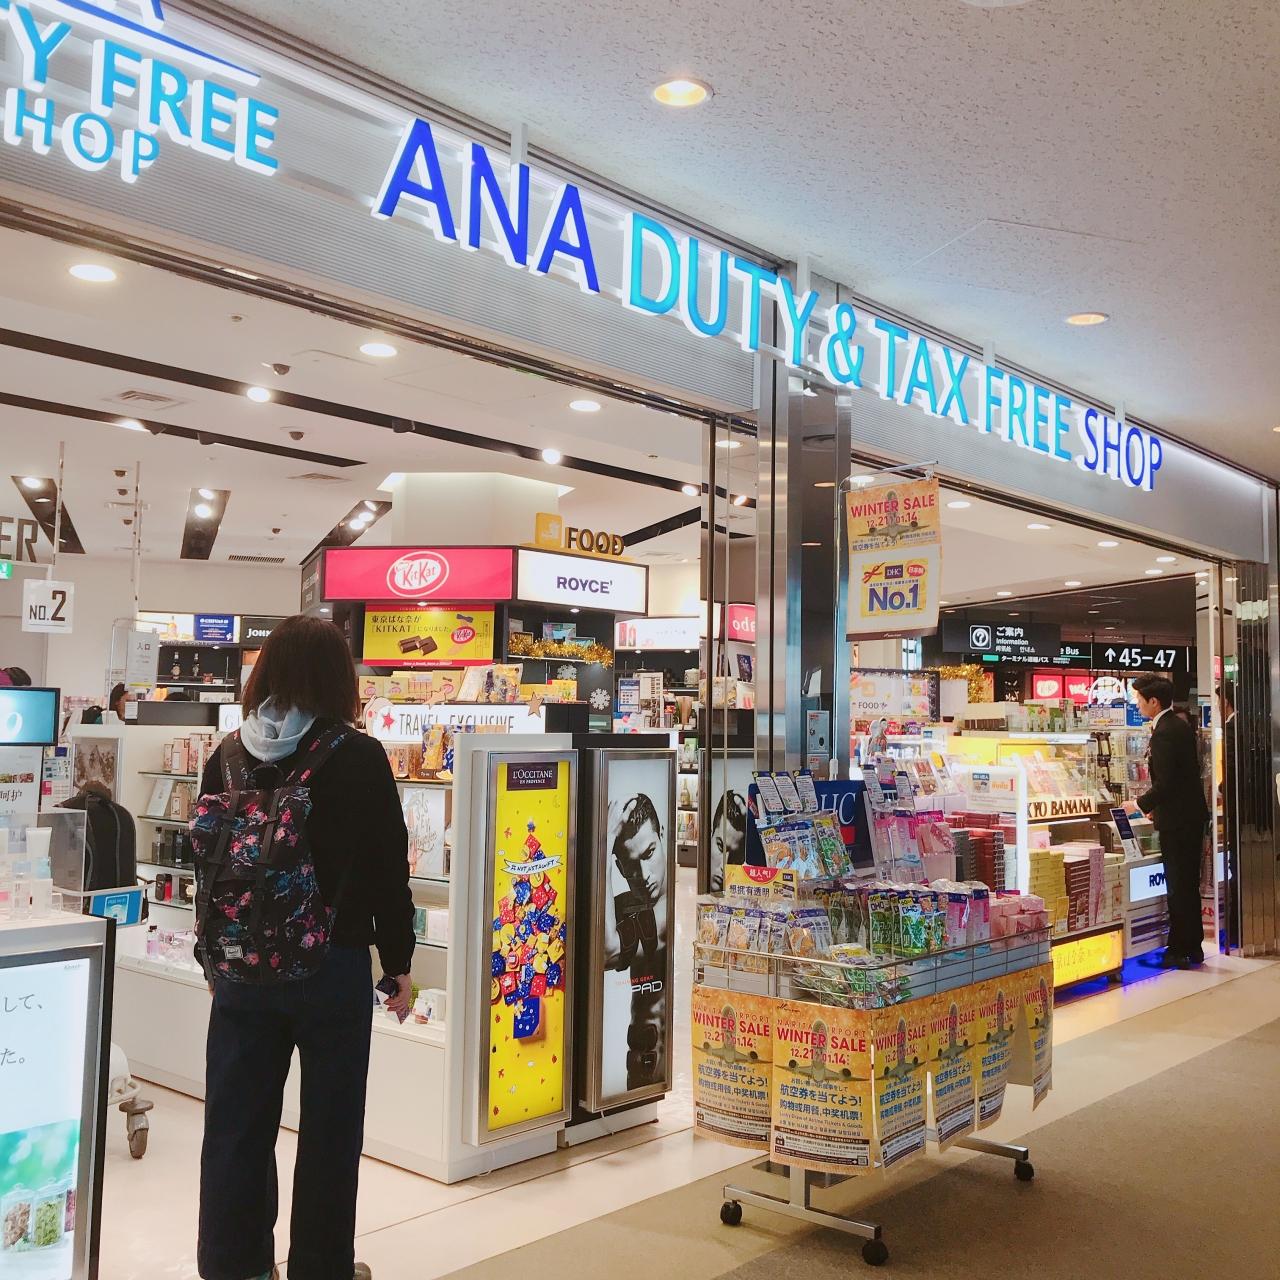 Specialty Travel: 成田空港 ANA DUTY FREE SHOP (第1ターミナル南ウィング) クチコミ一覧【フォートラベル】